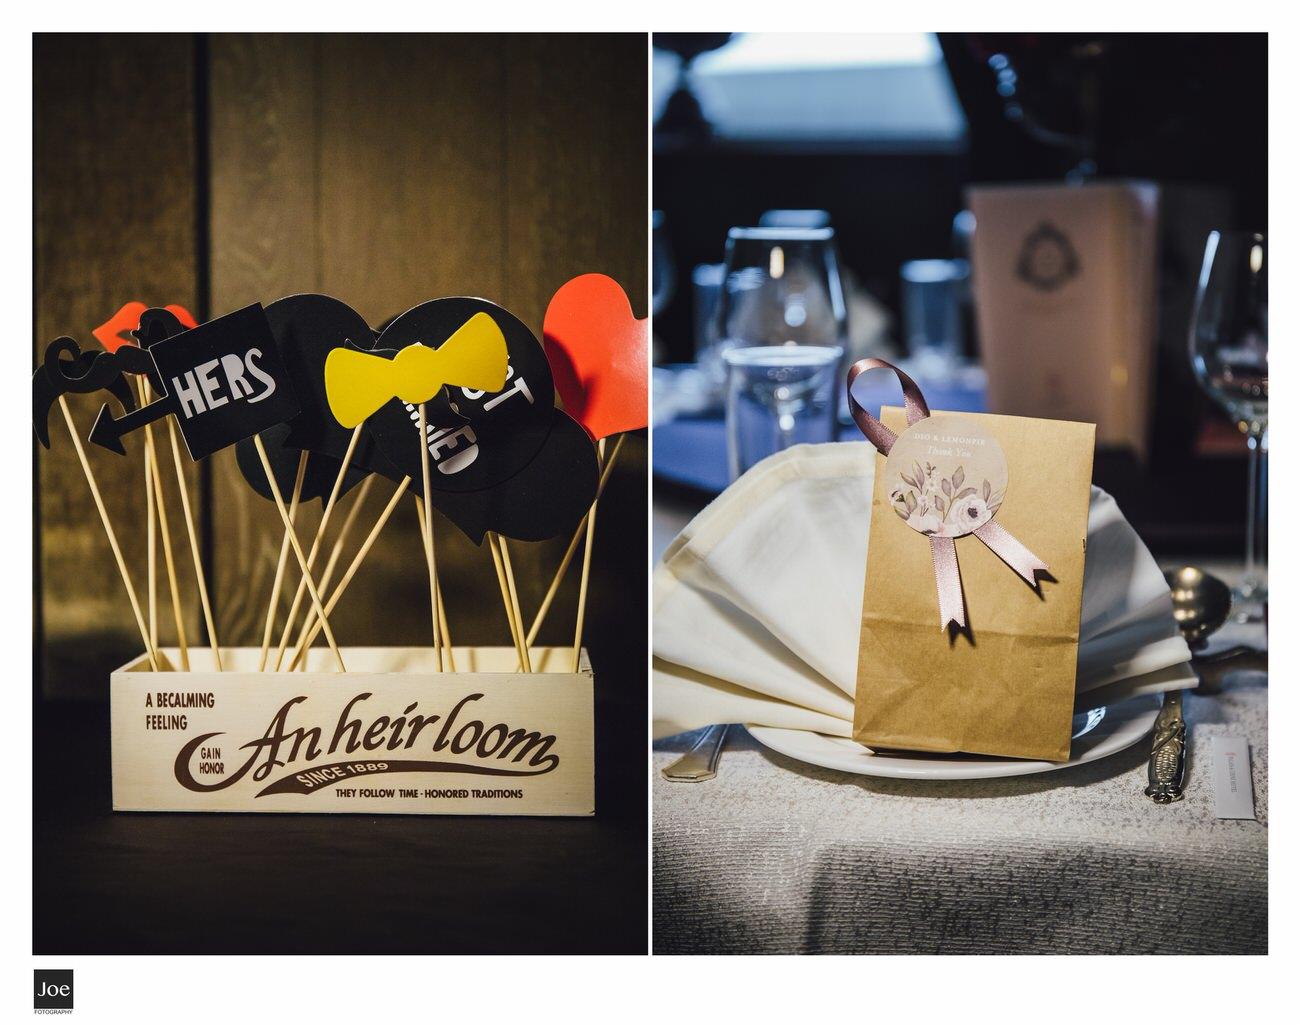 joe-fotography-wedding-photo-palais-de-chine-hotel-010.jpg